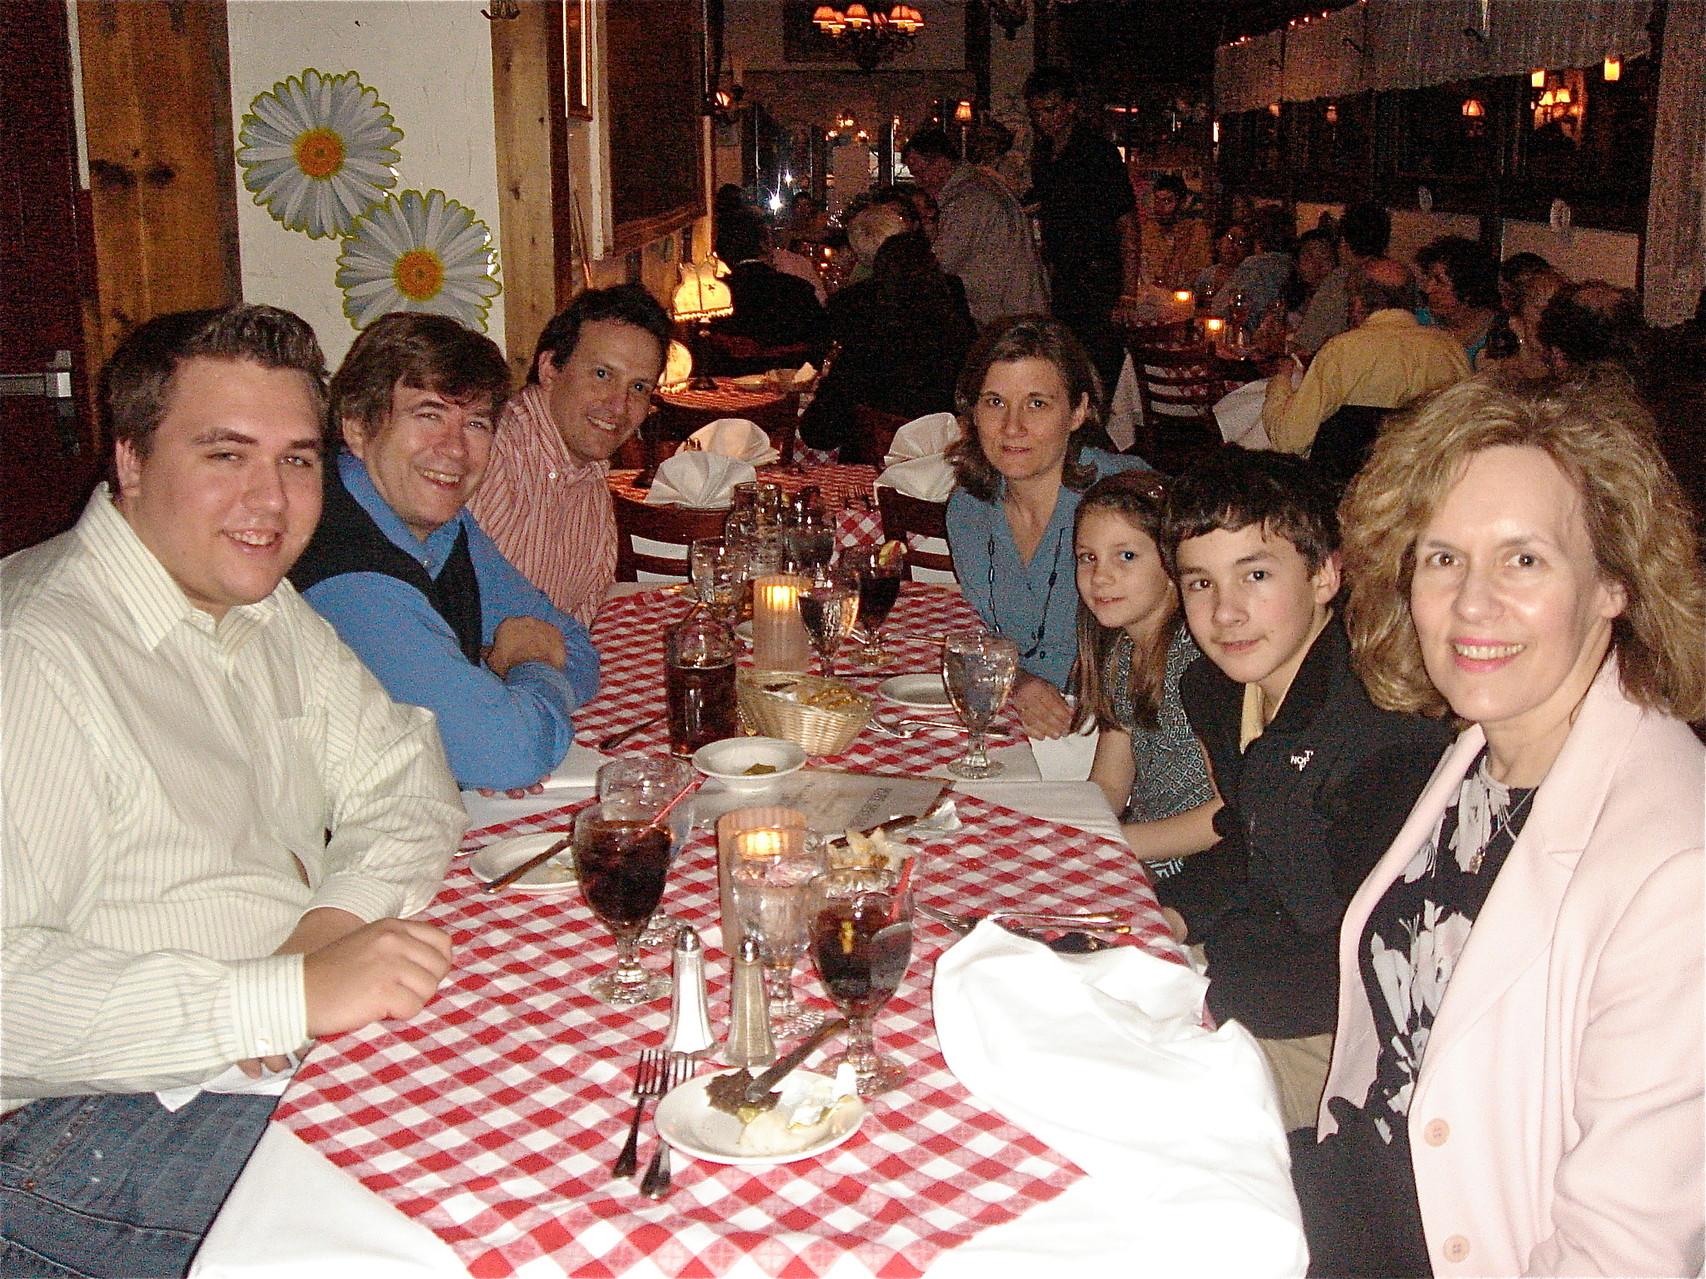 2009? Heidelberg Rest. NYC Greg, John, Nick, Cyndi, Sara, Trevan, Lorraine